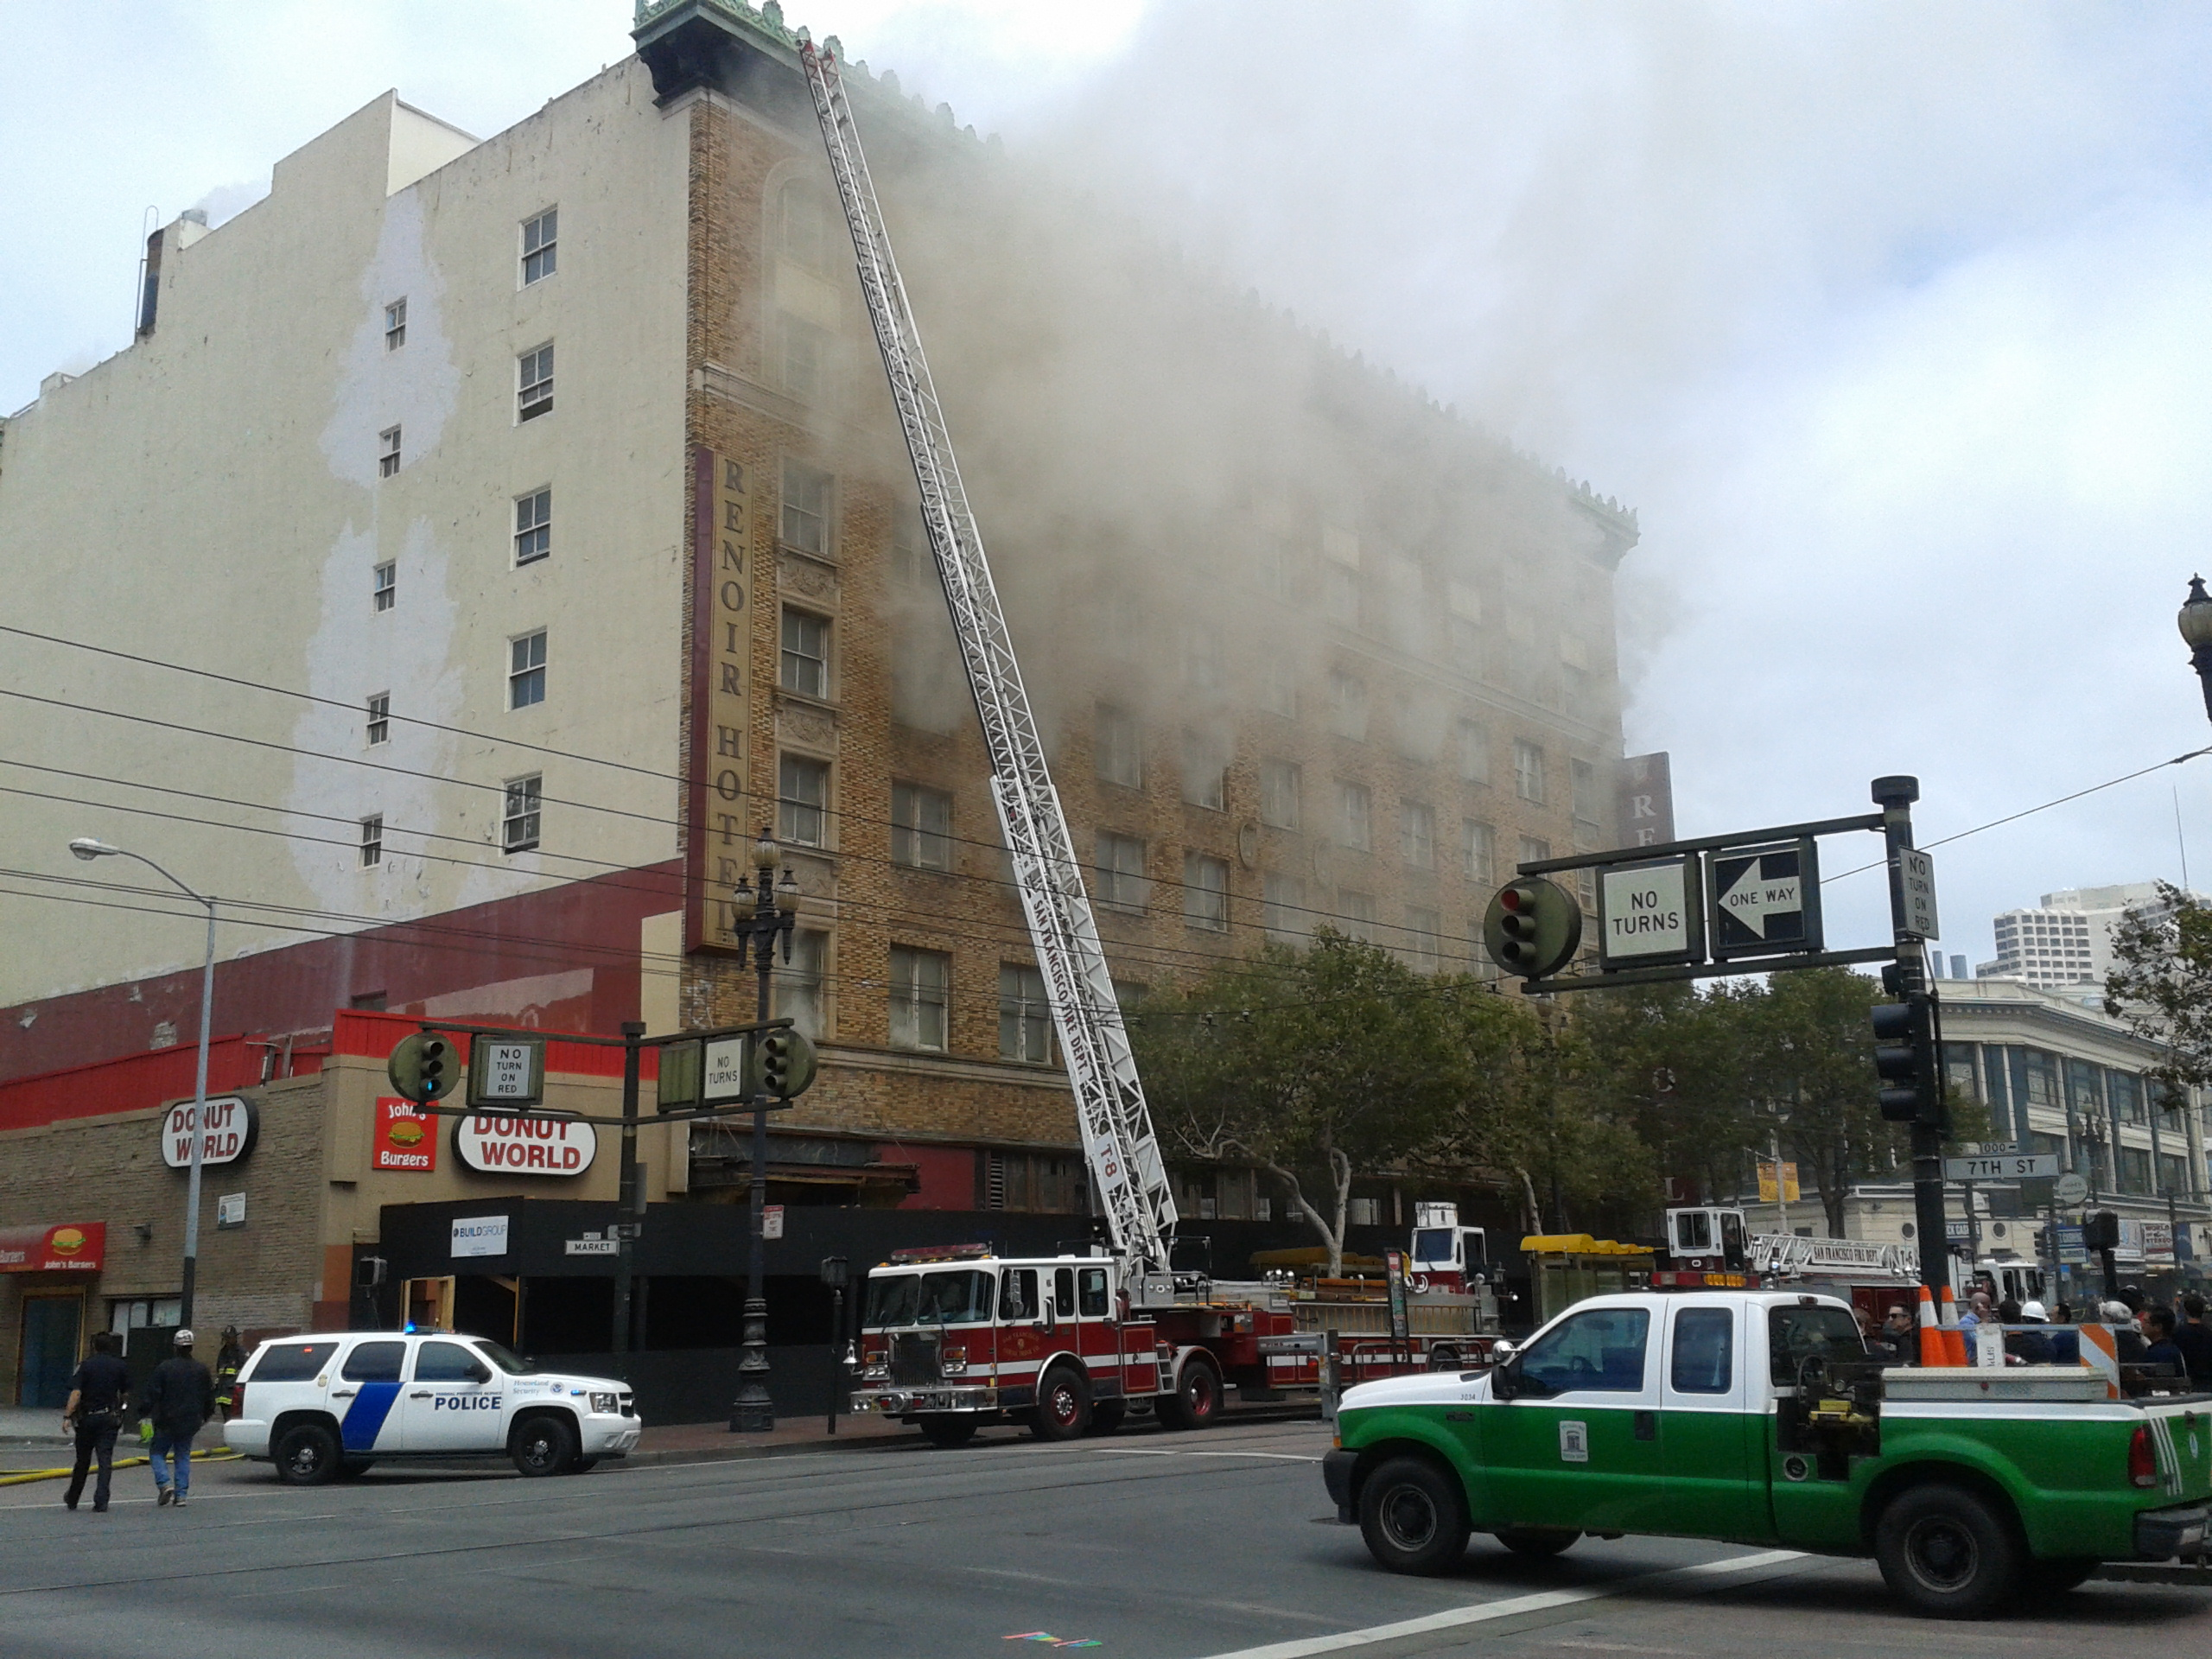 A three-alarm fire Monday damaged the shuttered Renoir Hotel in San Francisco's Mid-Market area. (Scott Morris/Bay City News)